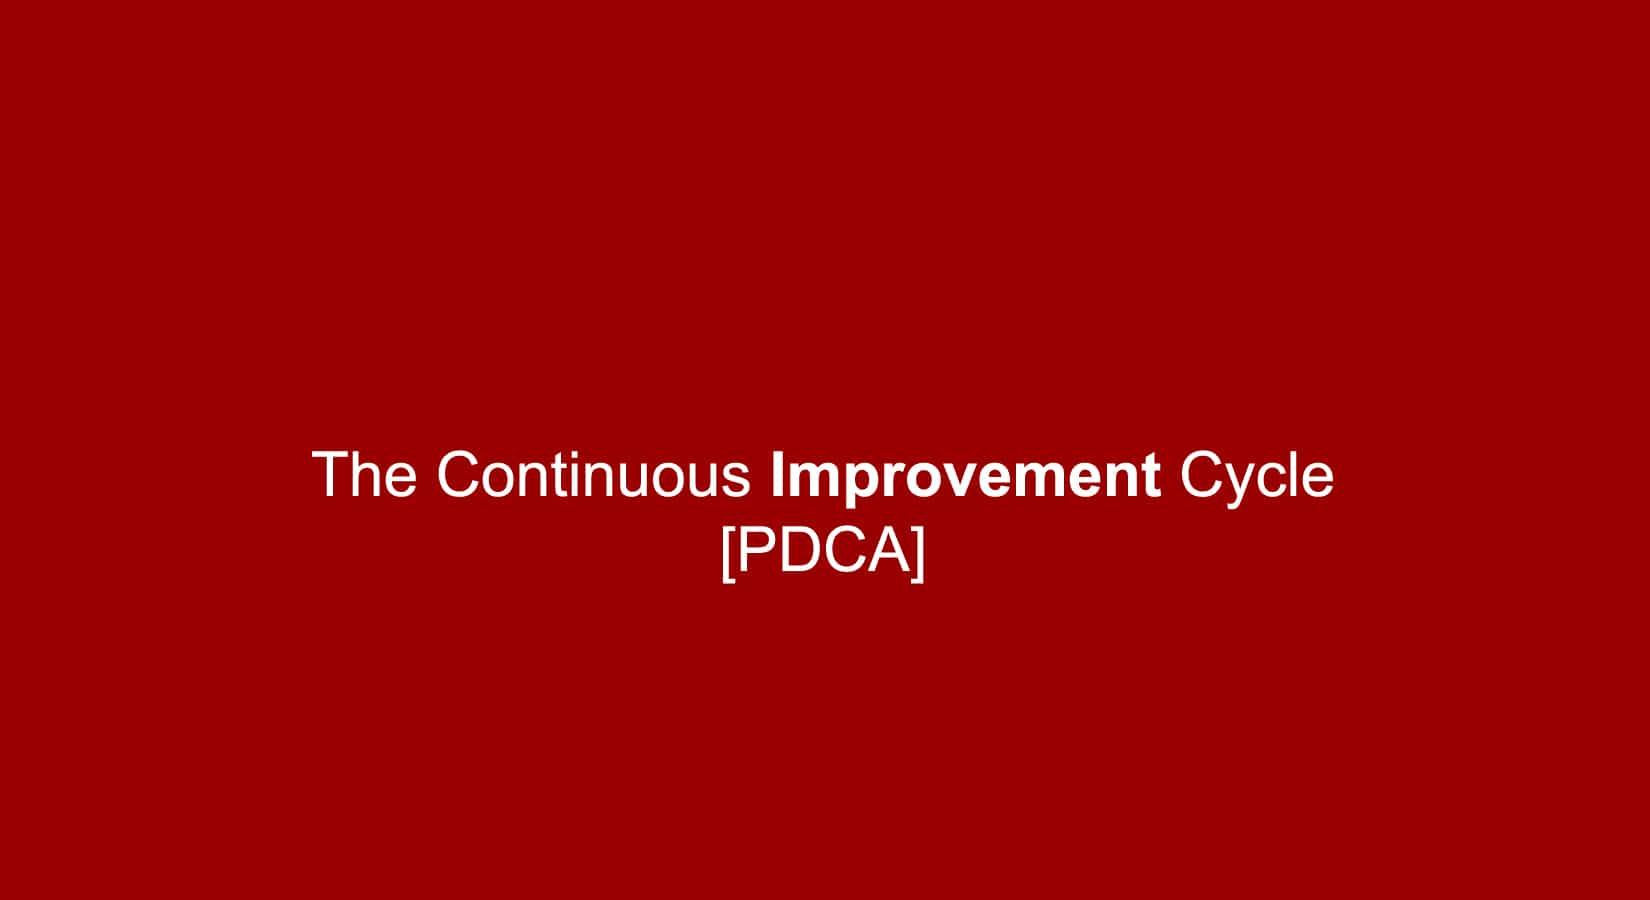 Impruver PDCA